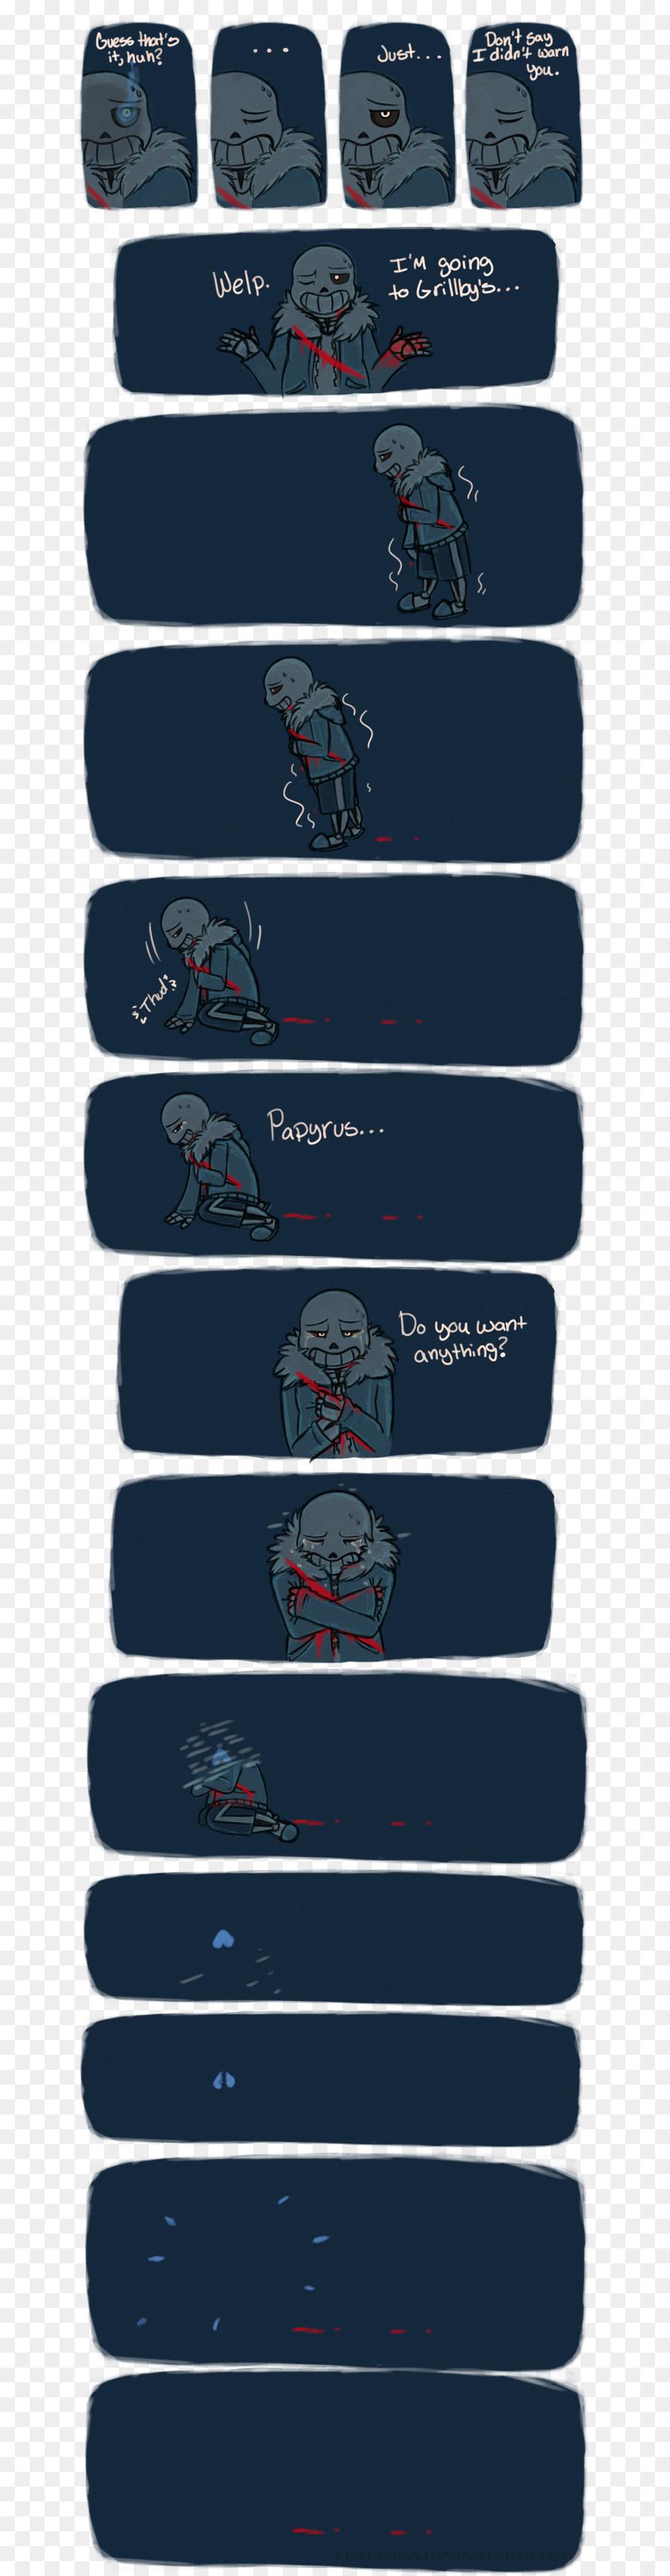 Undertale Comics Kintanga Toriel Papyrus 100 Gründe Warum Ich Dich